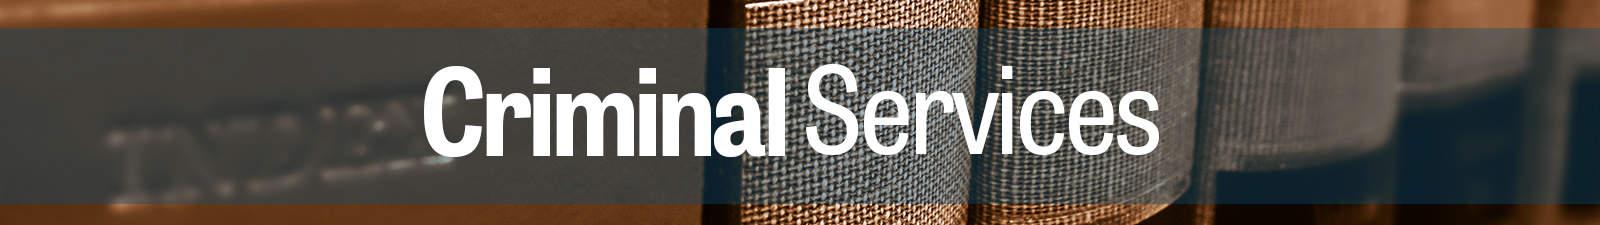 Arizona Criminal Defense Services